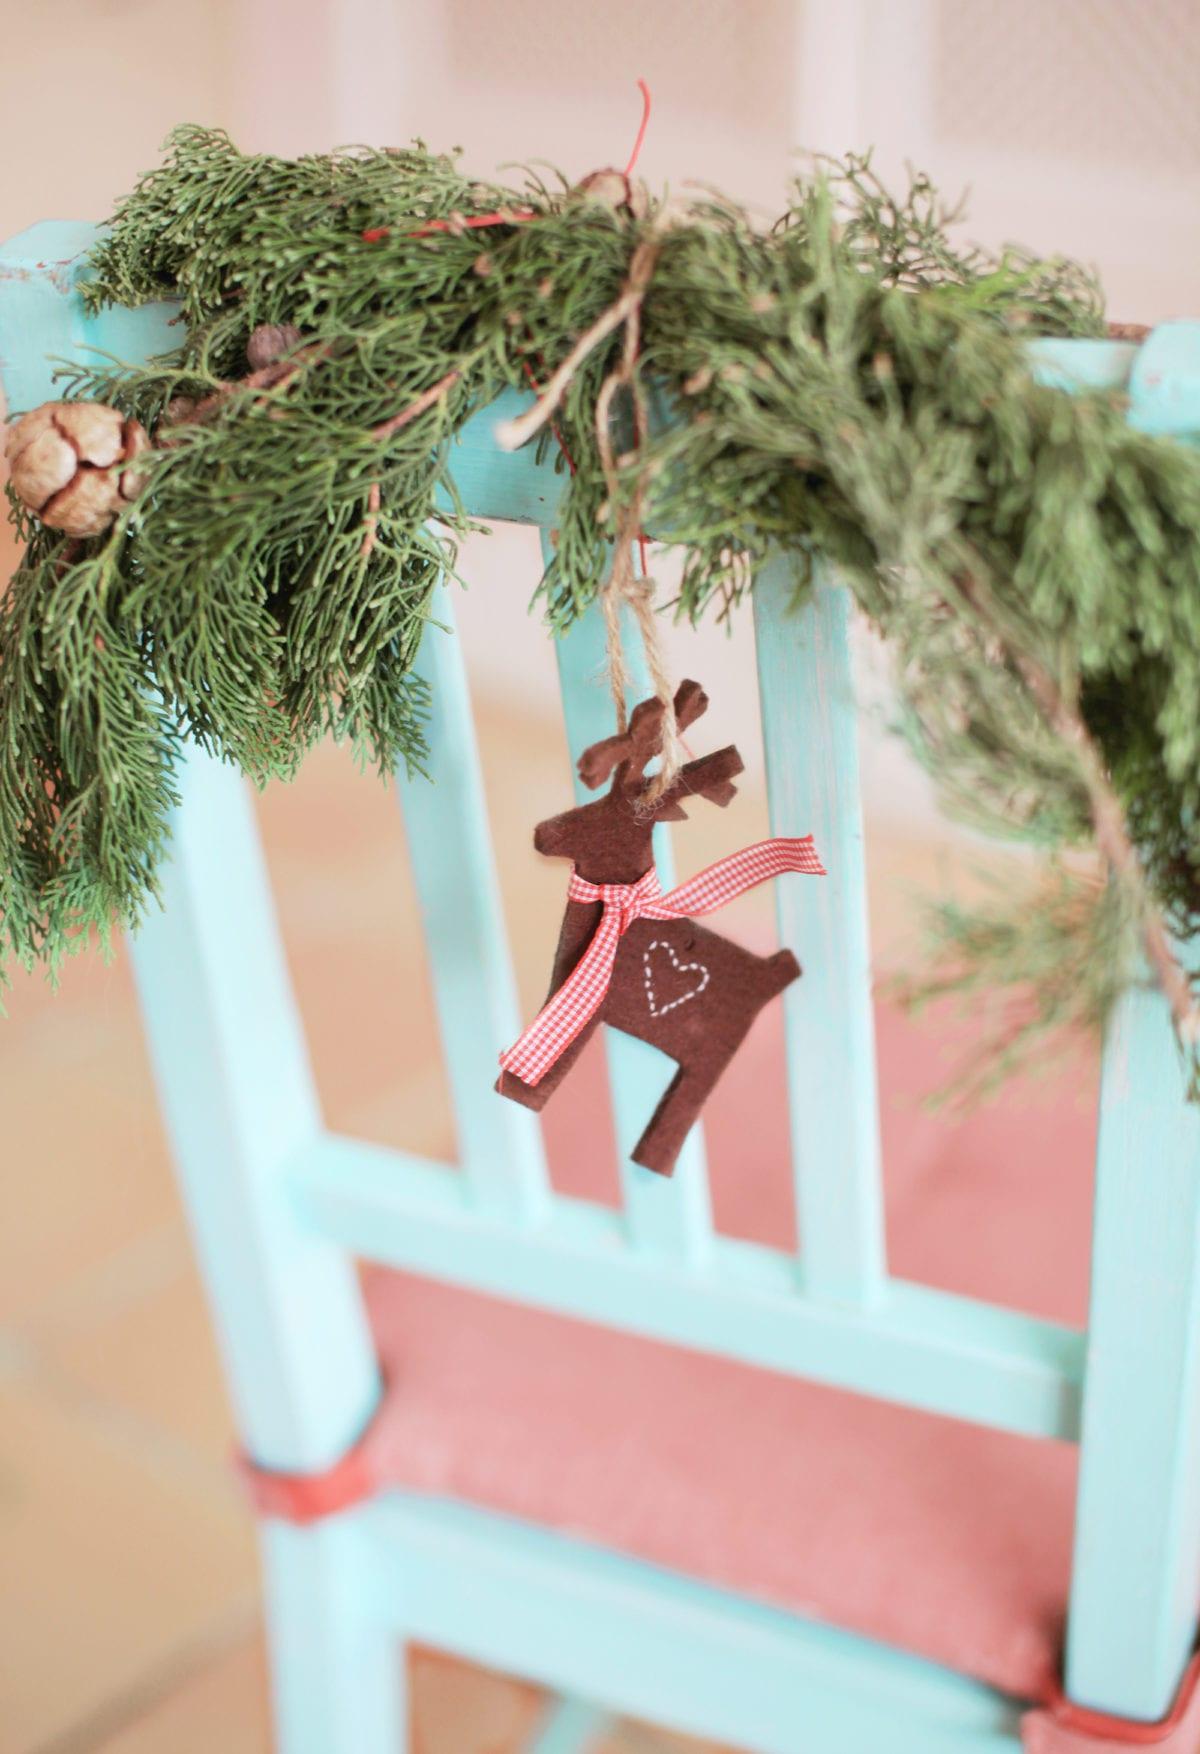 Christmas Tasks On Airtasker